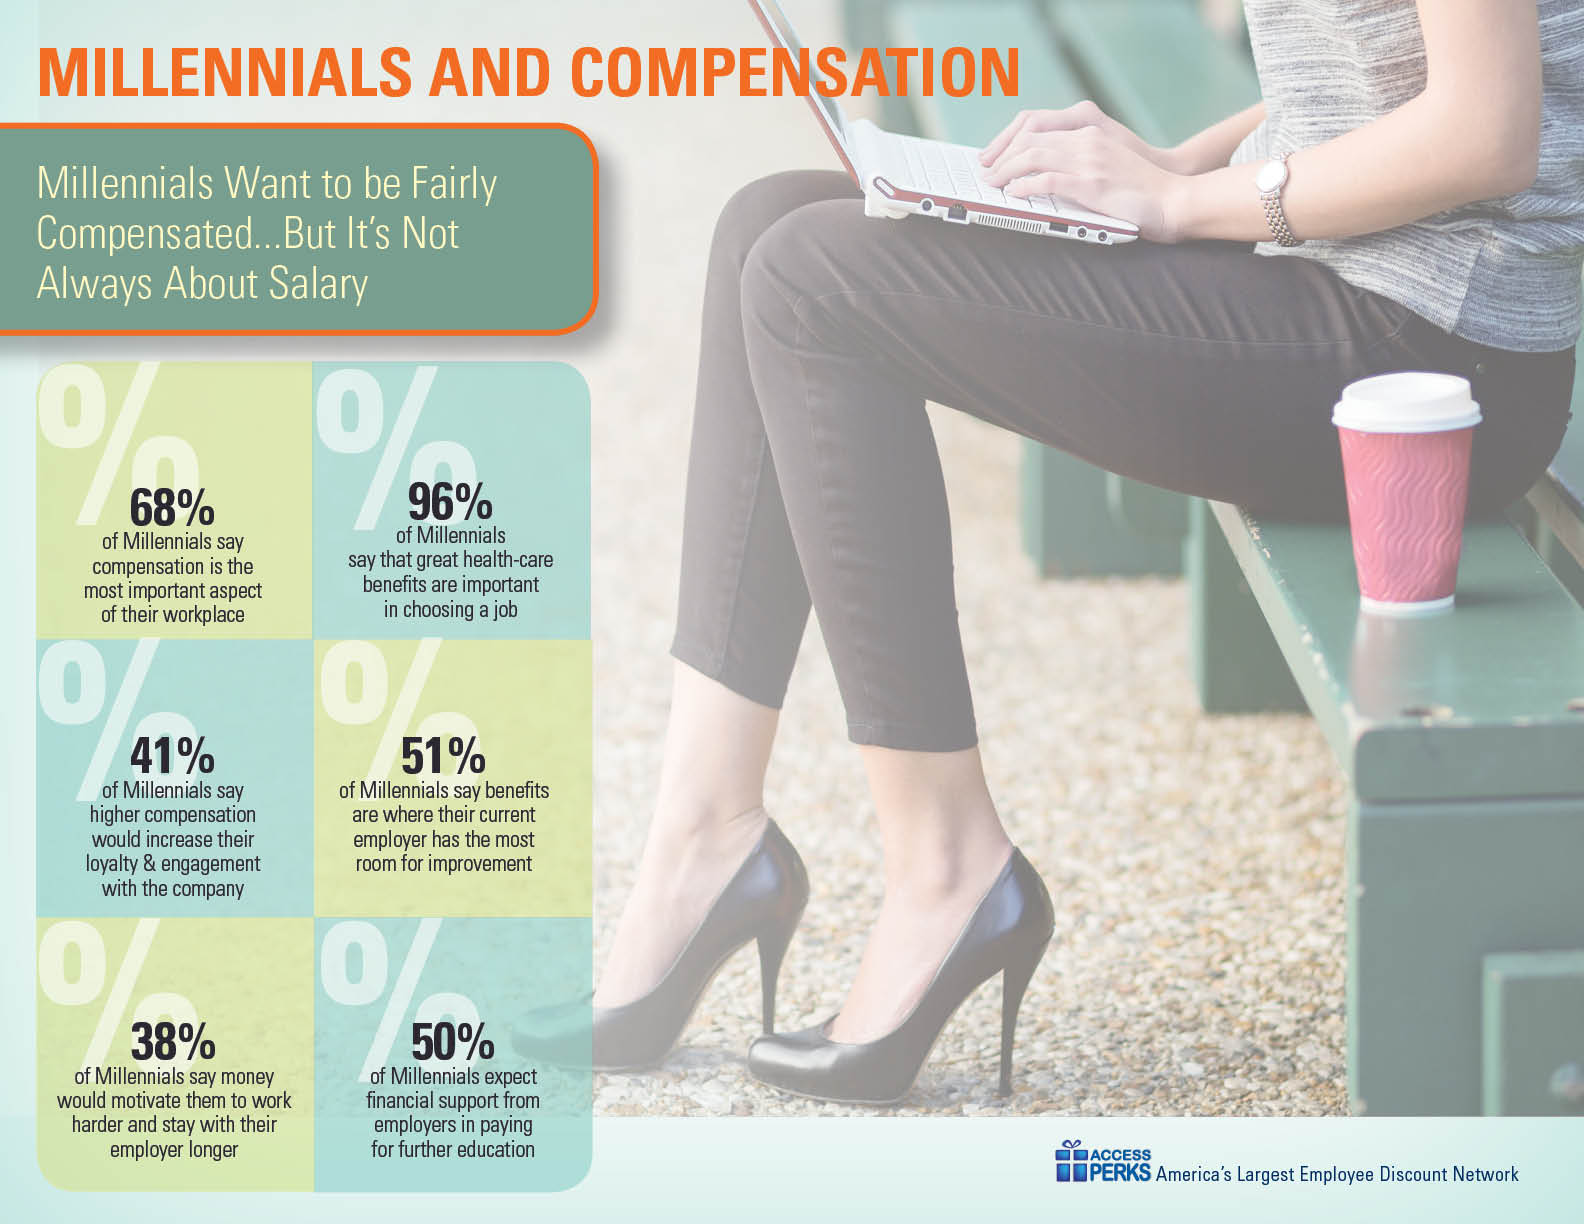 Millennials_and_Compensation_Infographic.jpg